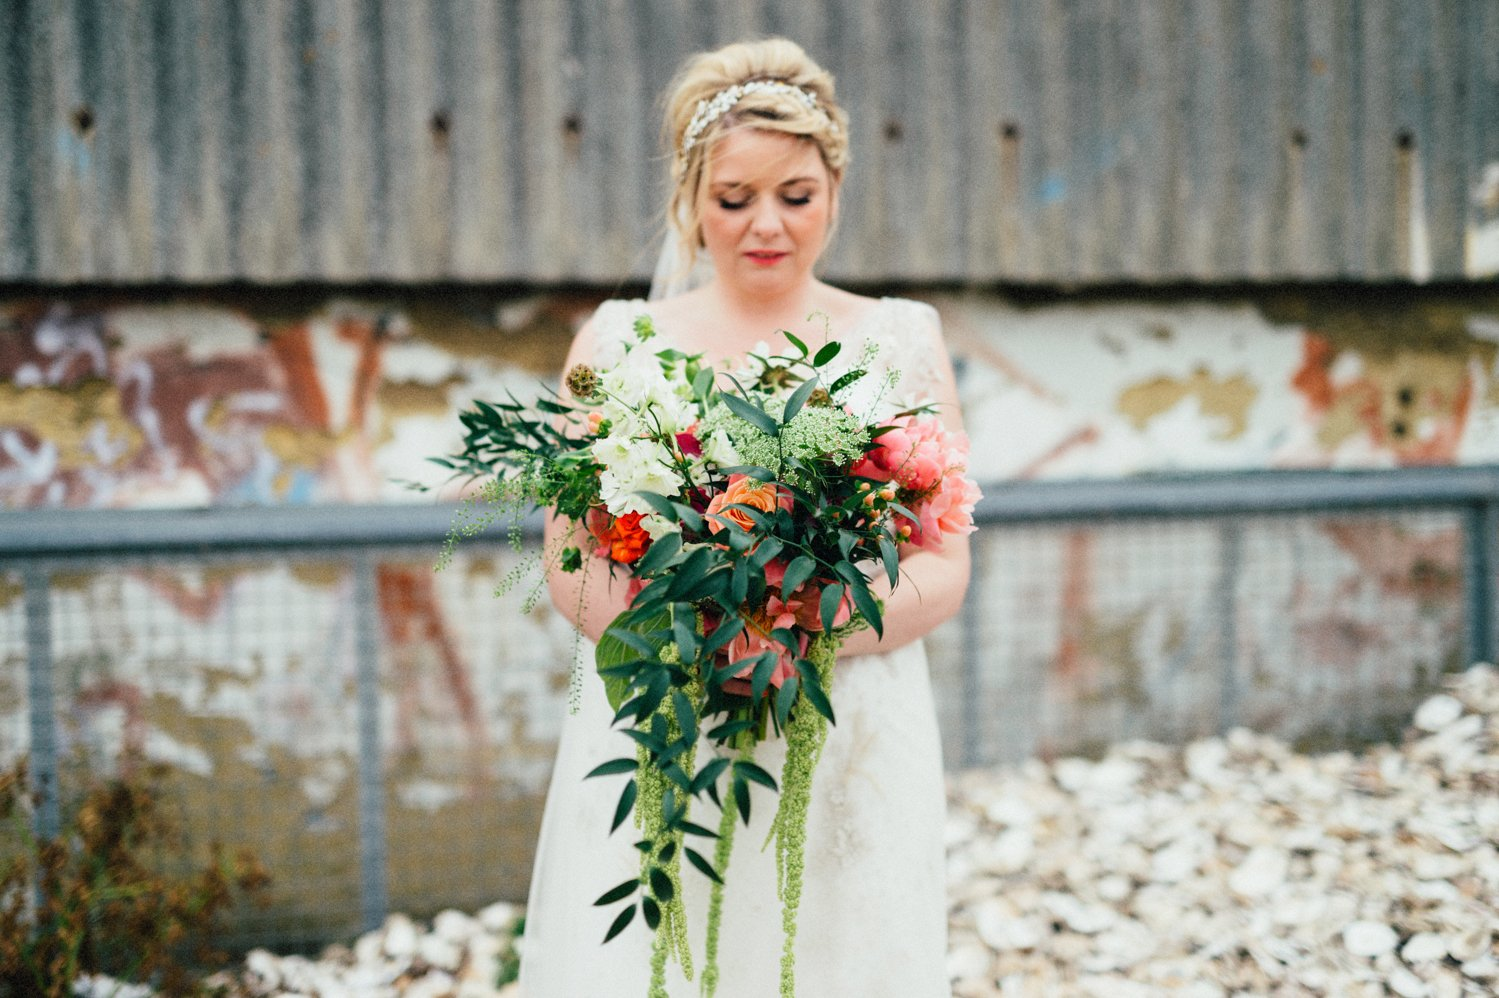 Bride holding A Vintage Wedding bouquet